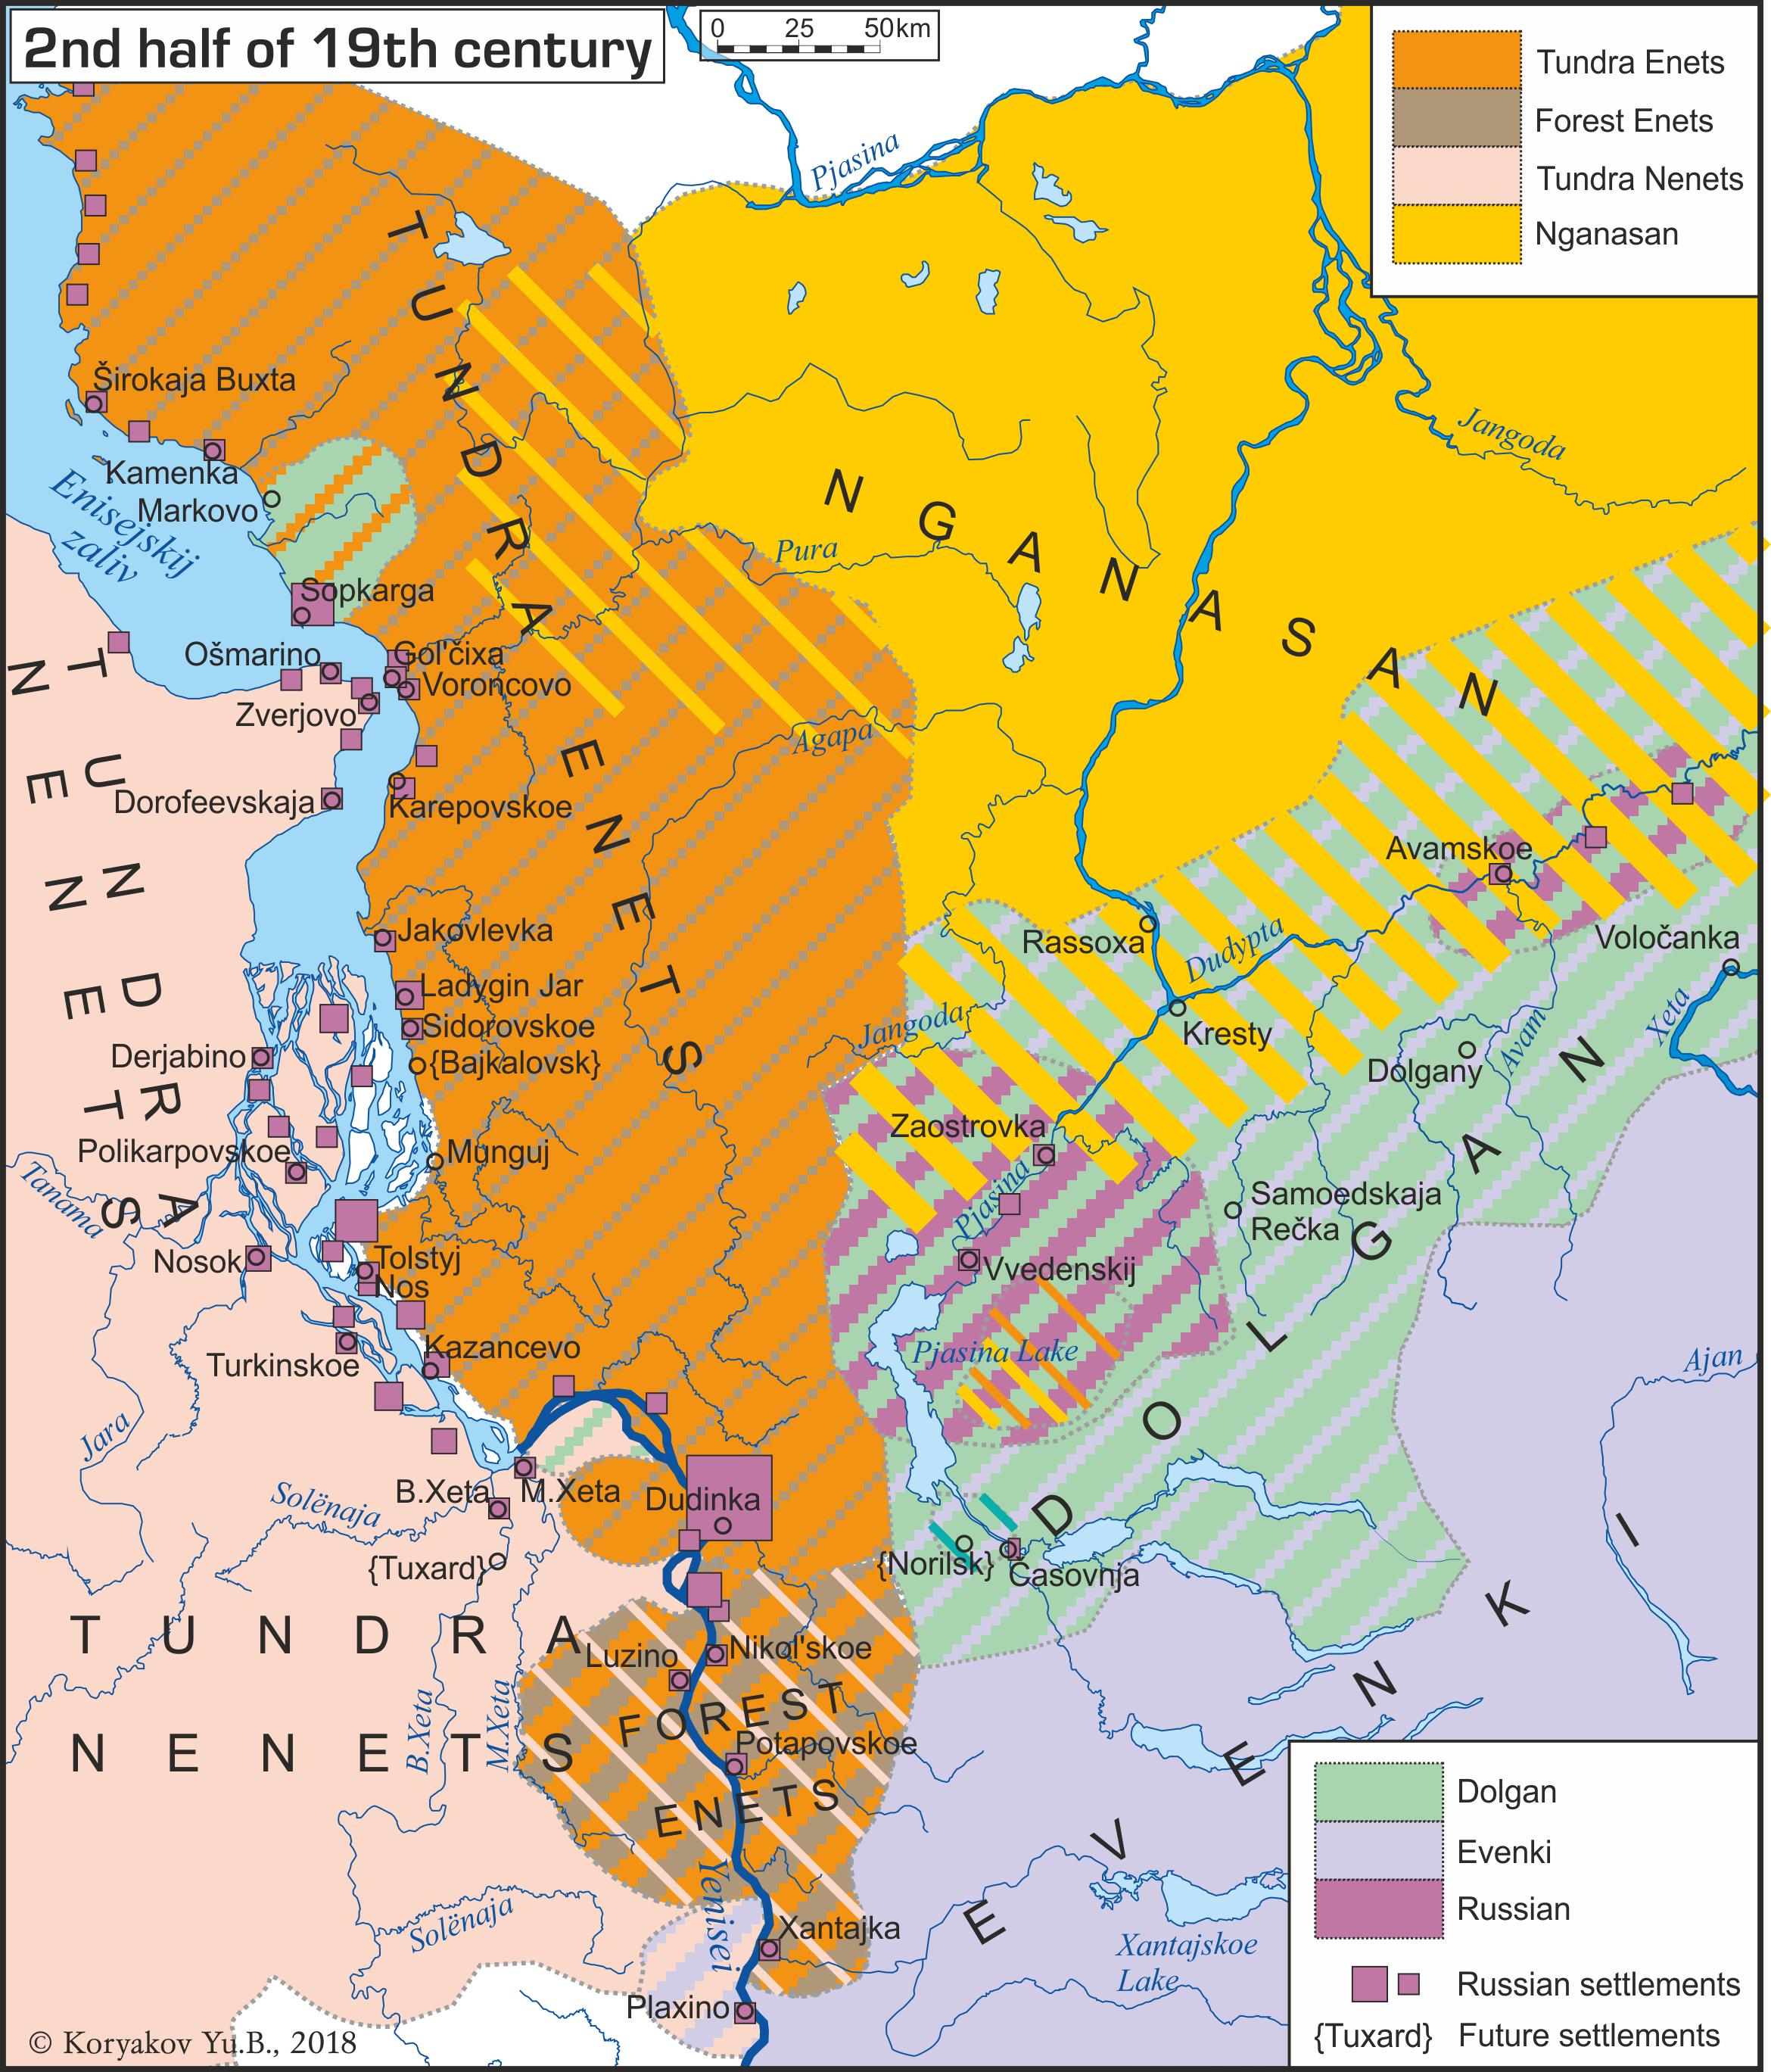 Languages of Western Tajmyr (2nd half of 19th century); авторы Ю.Б.Коряков, О.В.Ханина